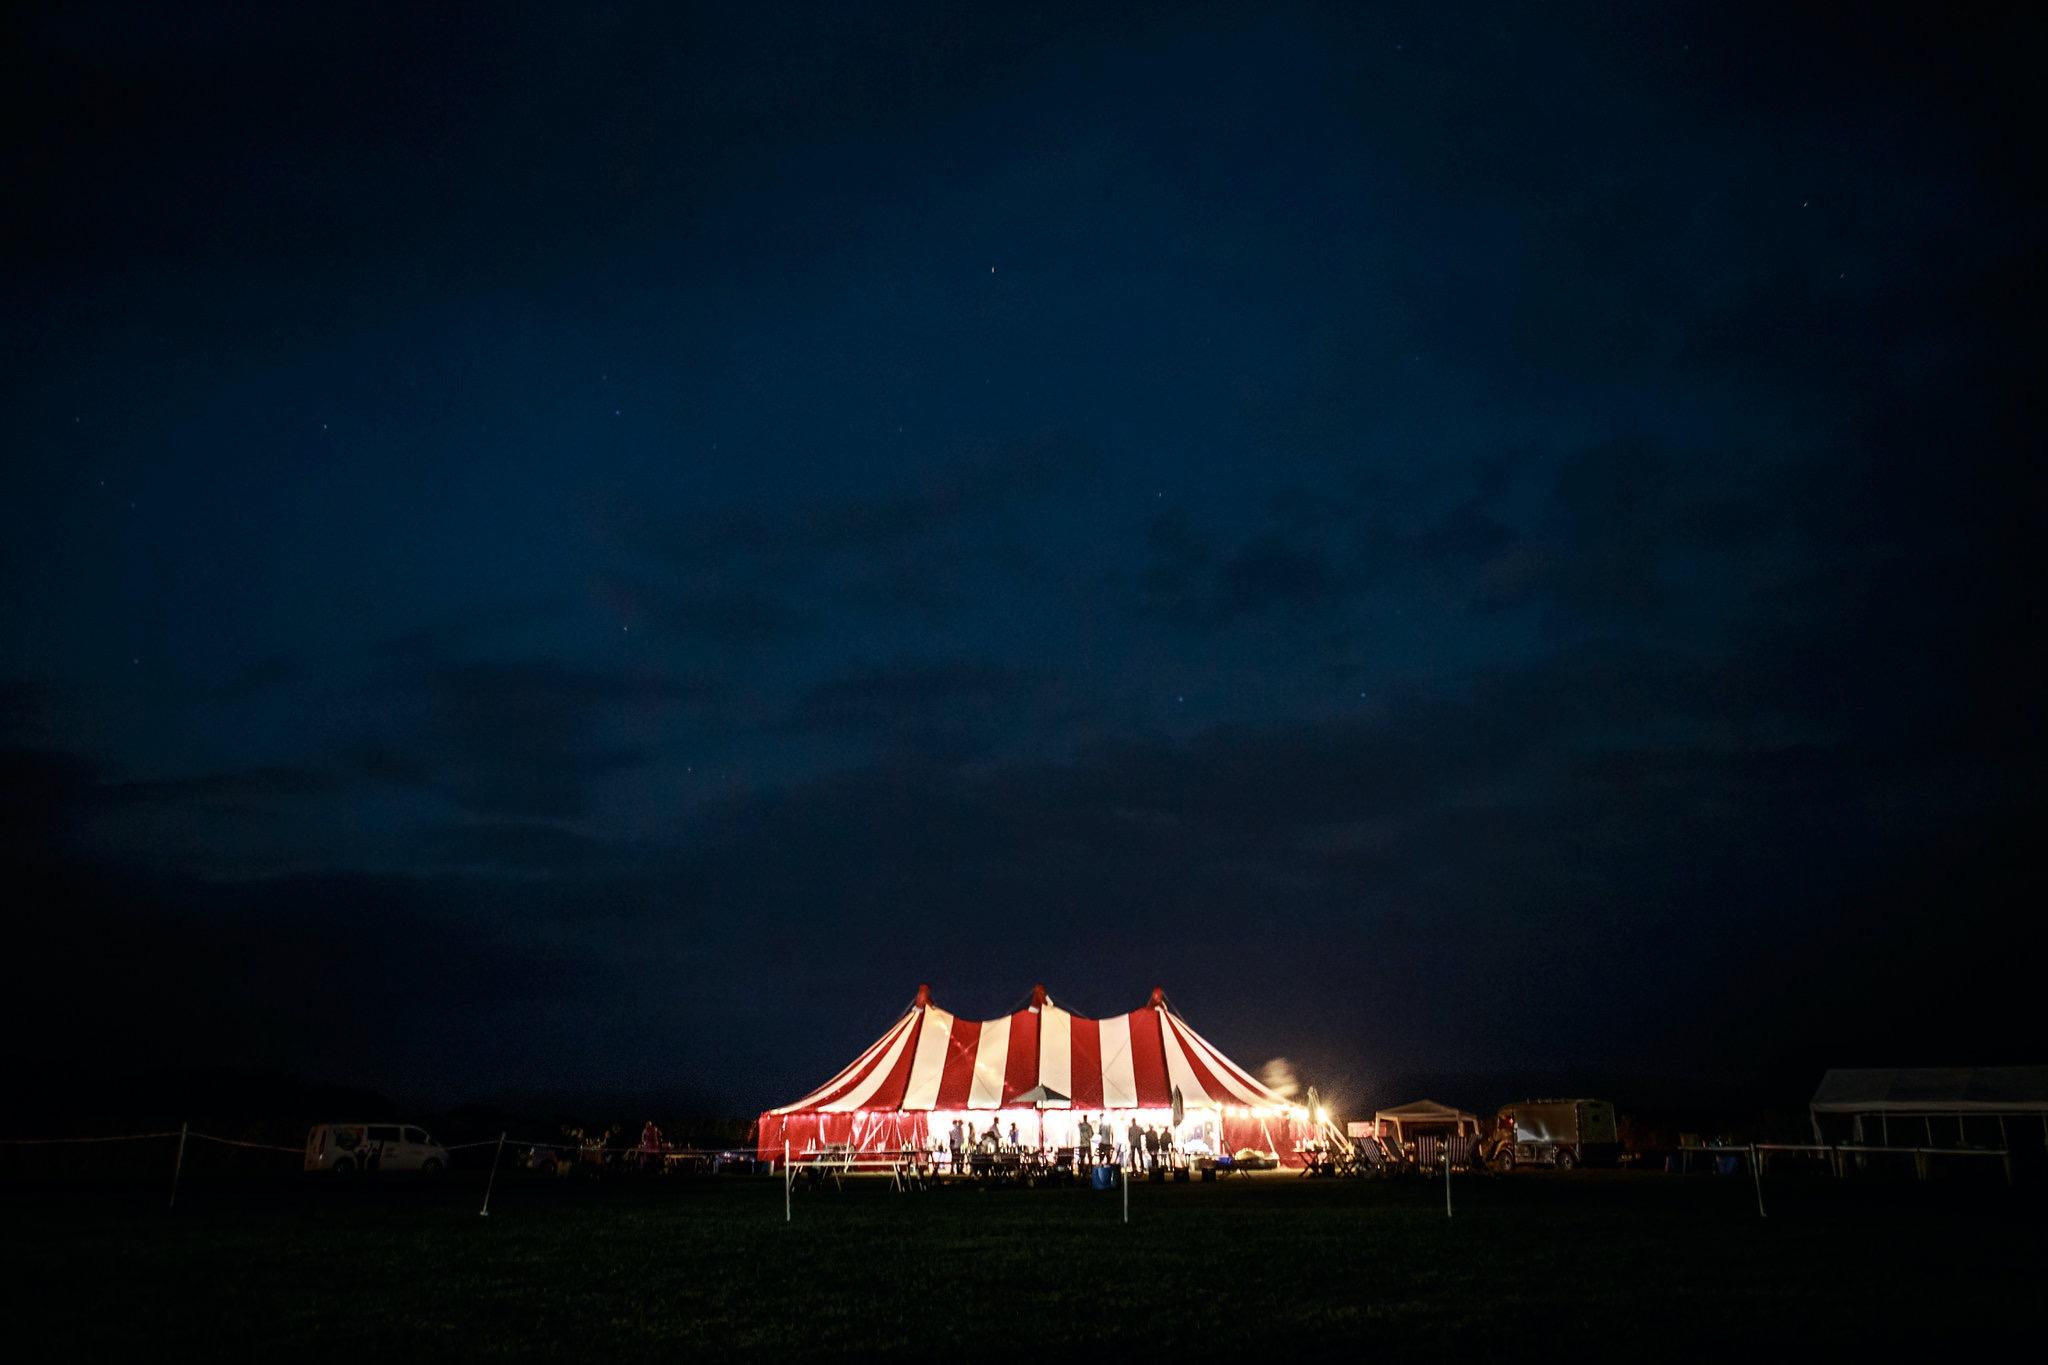 Circus tent wedding at night